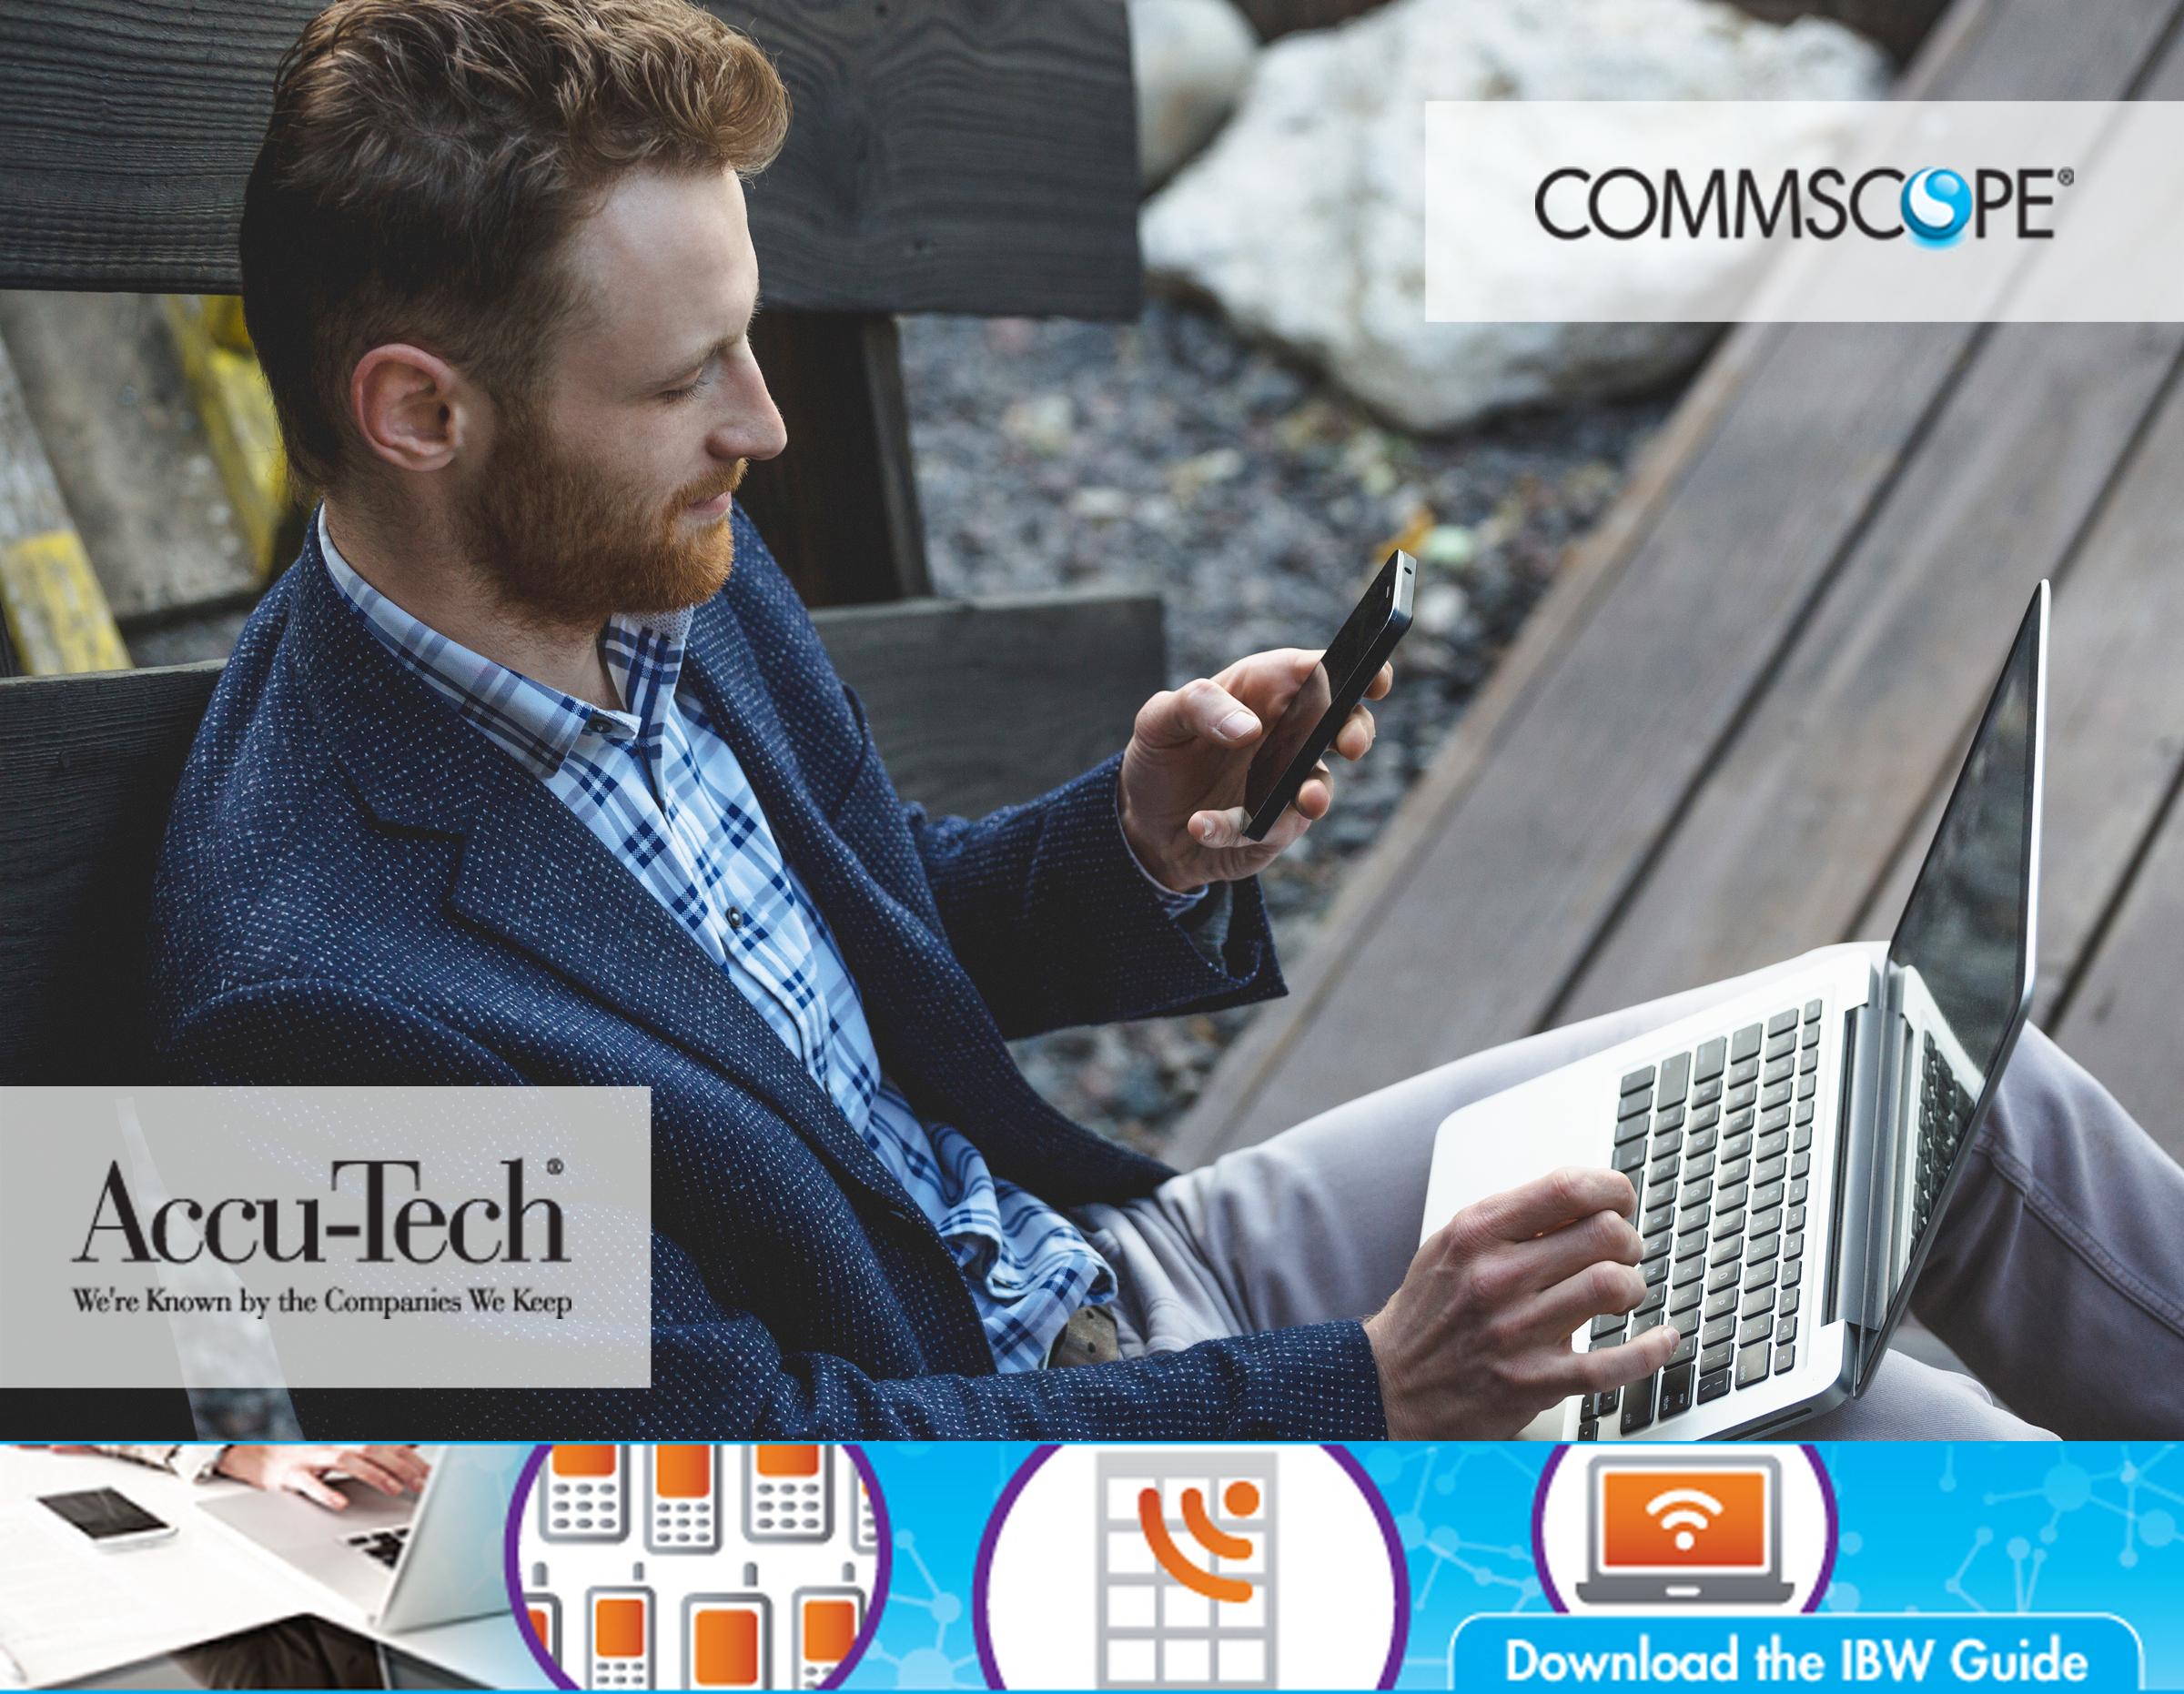 Accu-Tech_CommScope